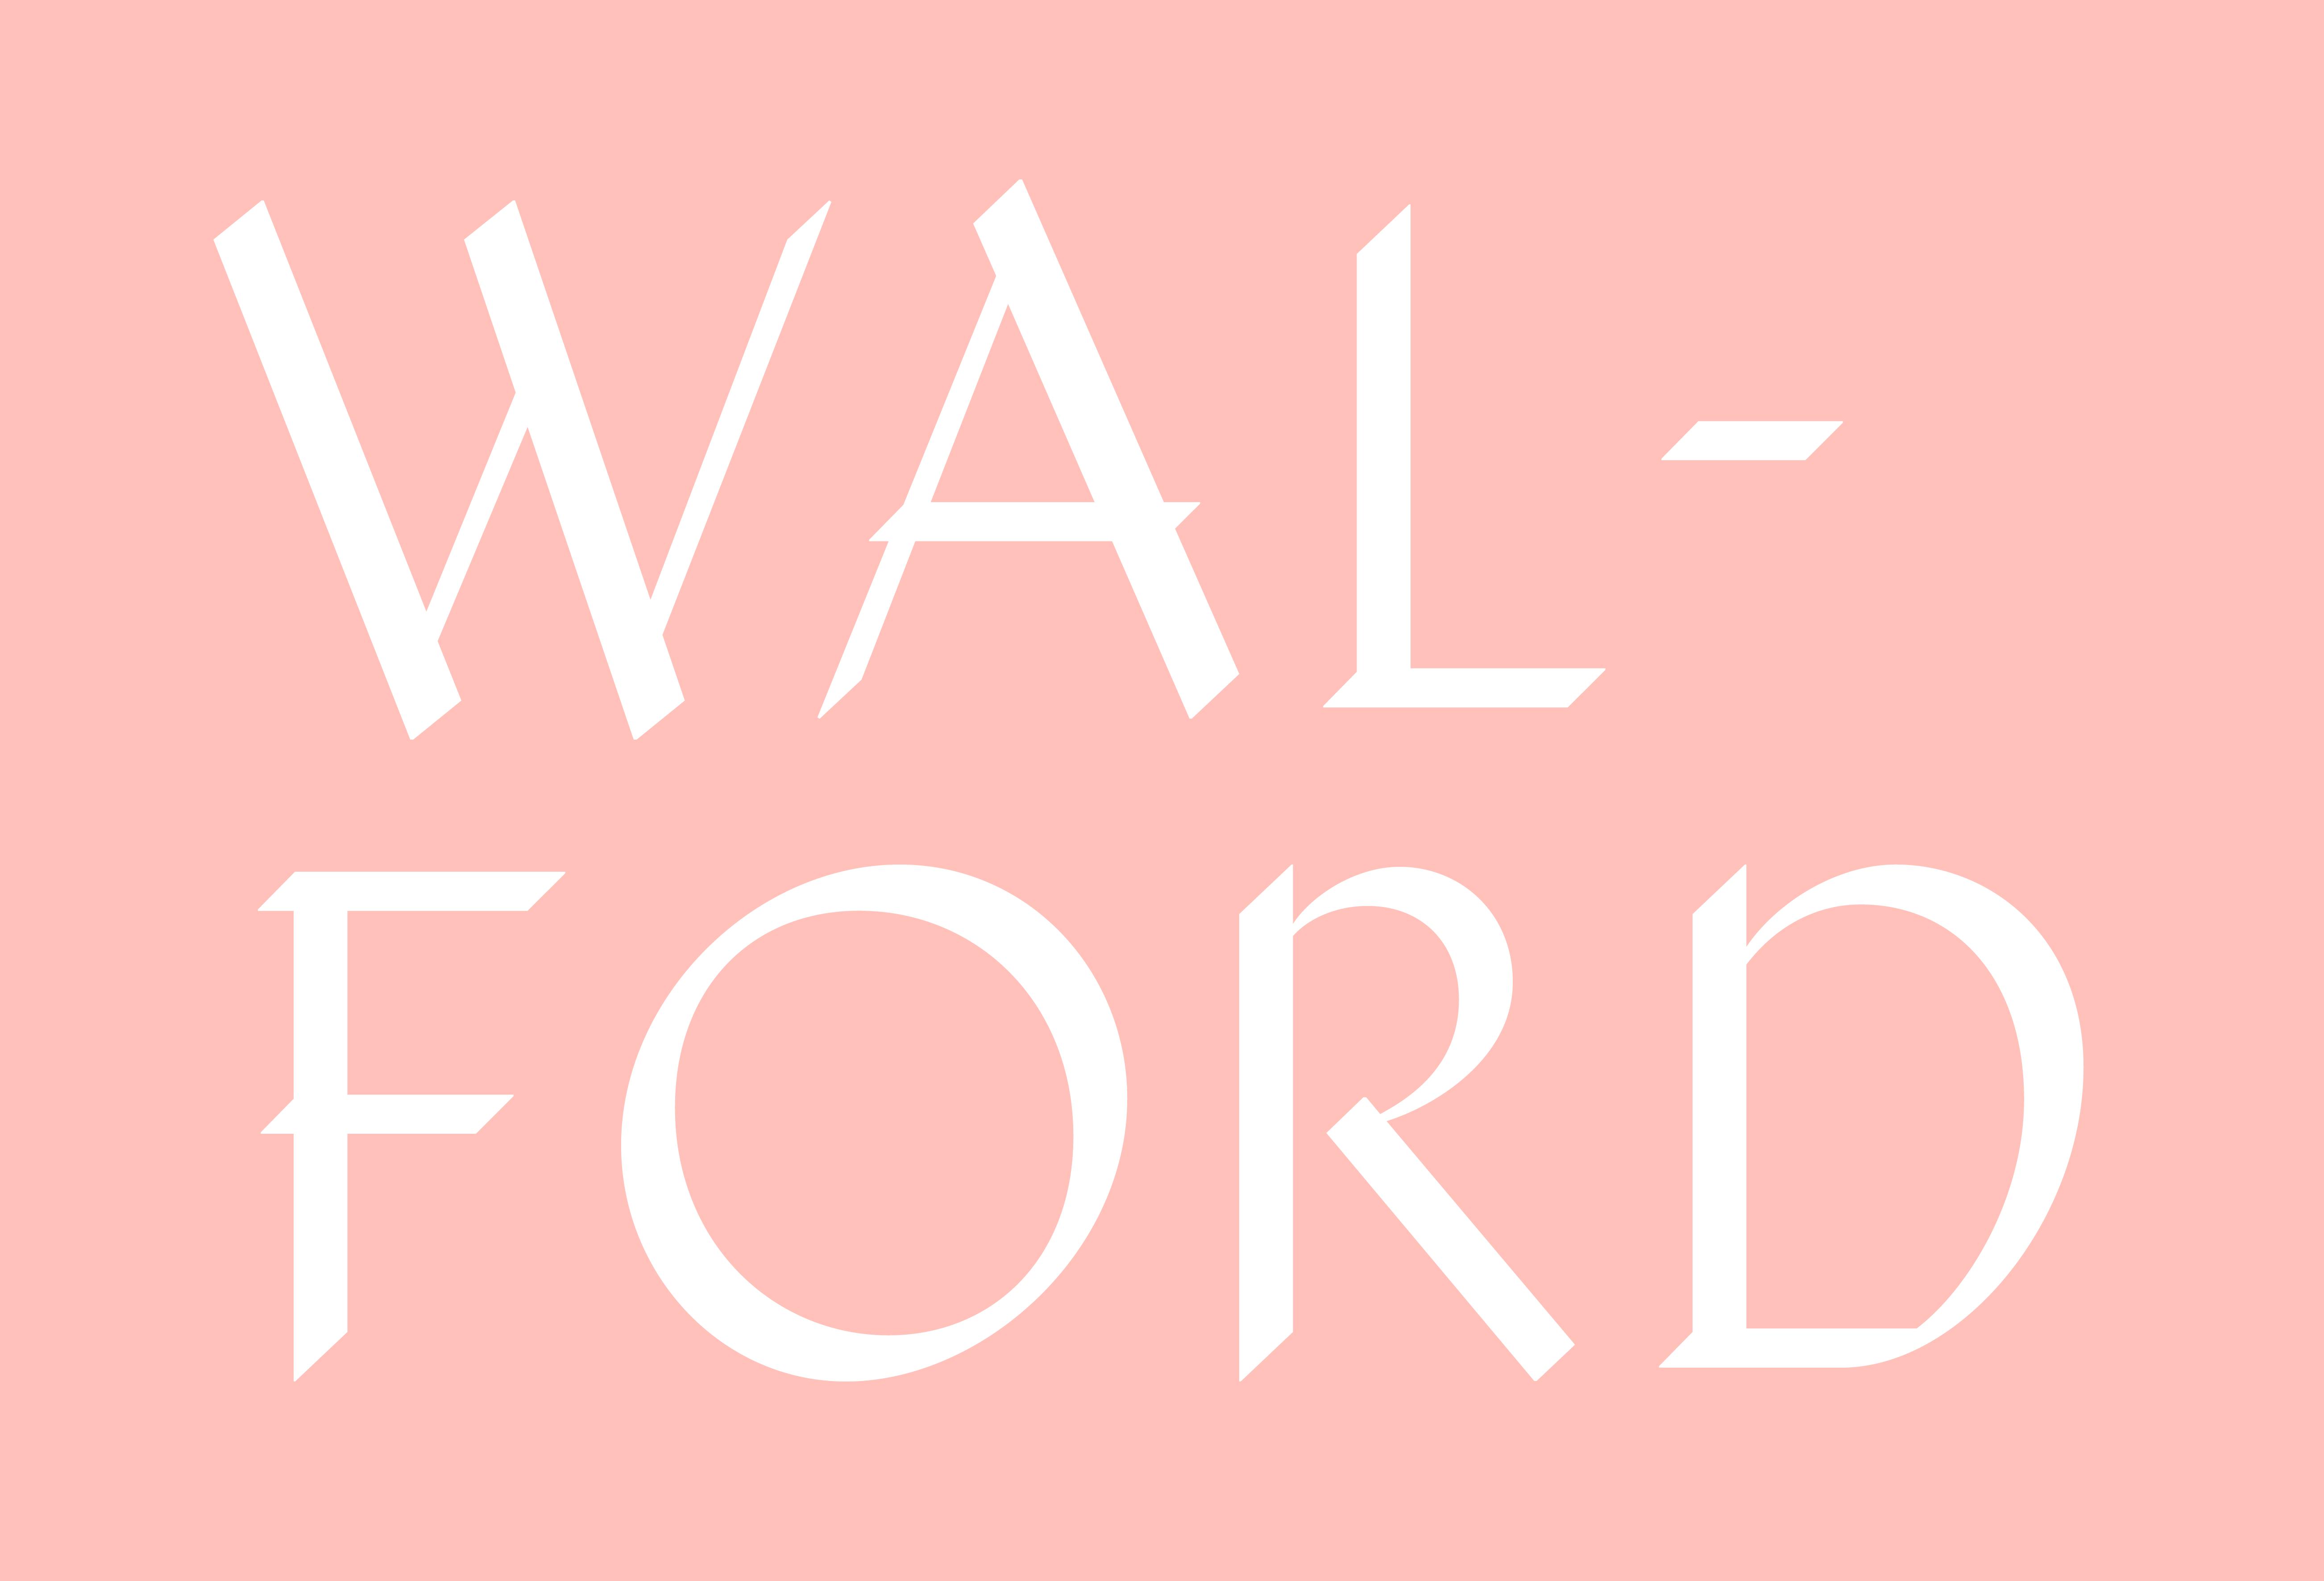 Walford_Ignacio_casco_portfolio2